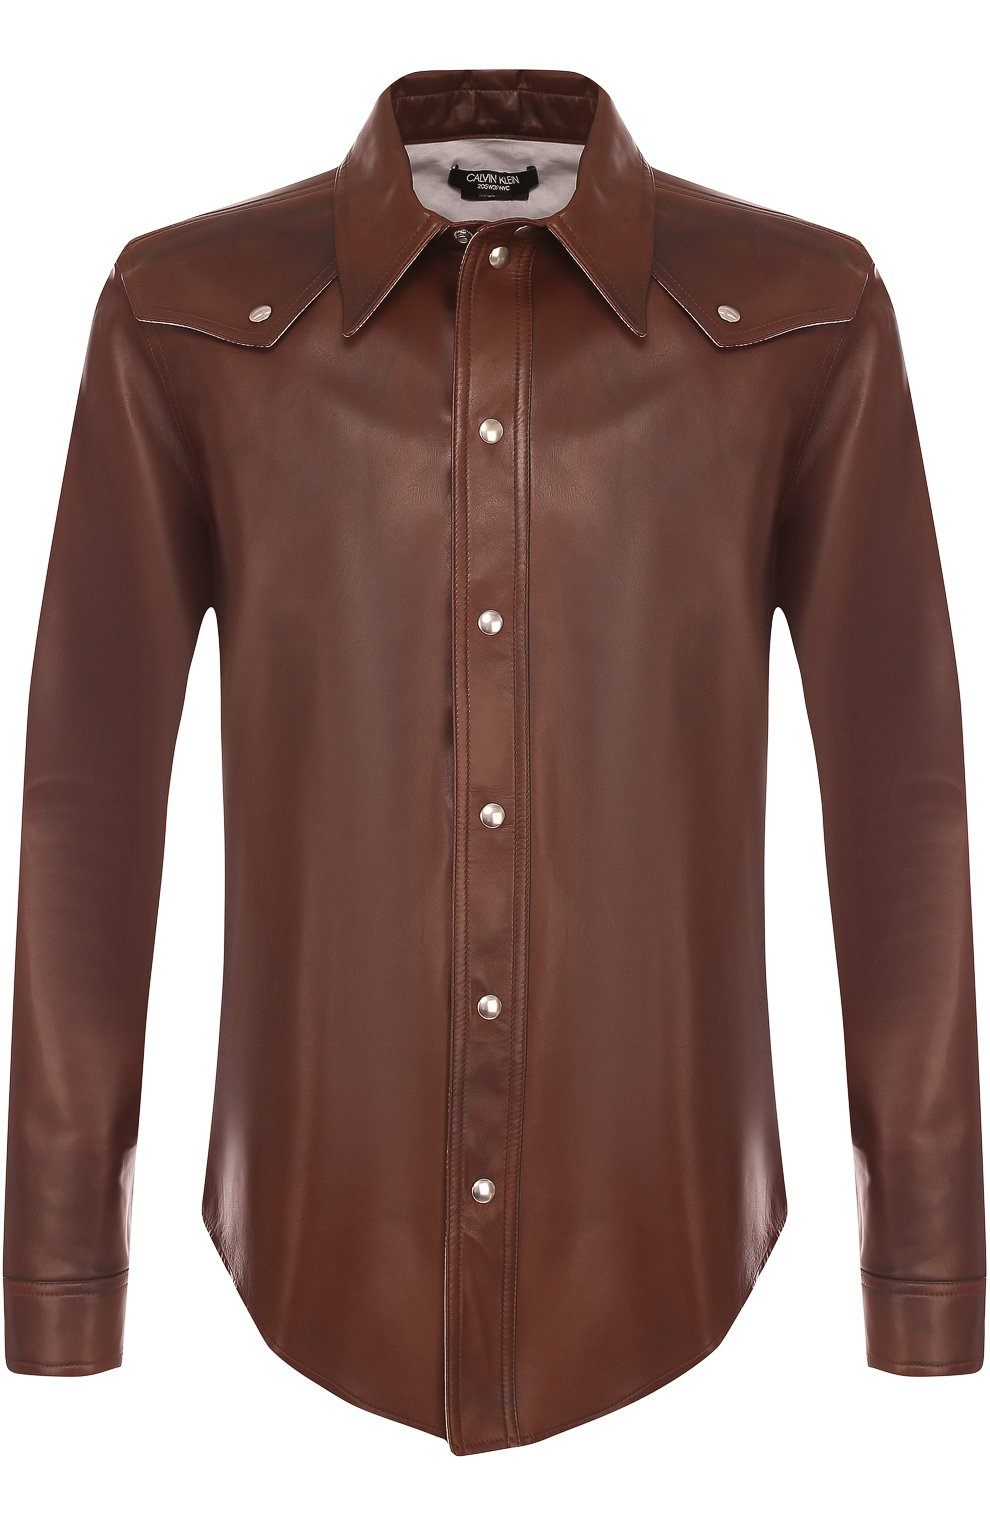 62a447364c6 Мужская коричневая кожаная рубашка на кнопках CALVIN KLEIN 205W39NYC ...